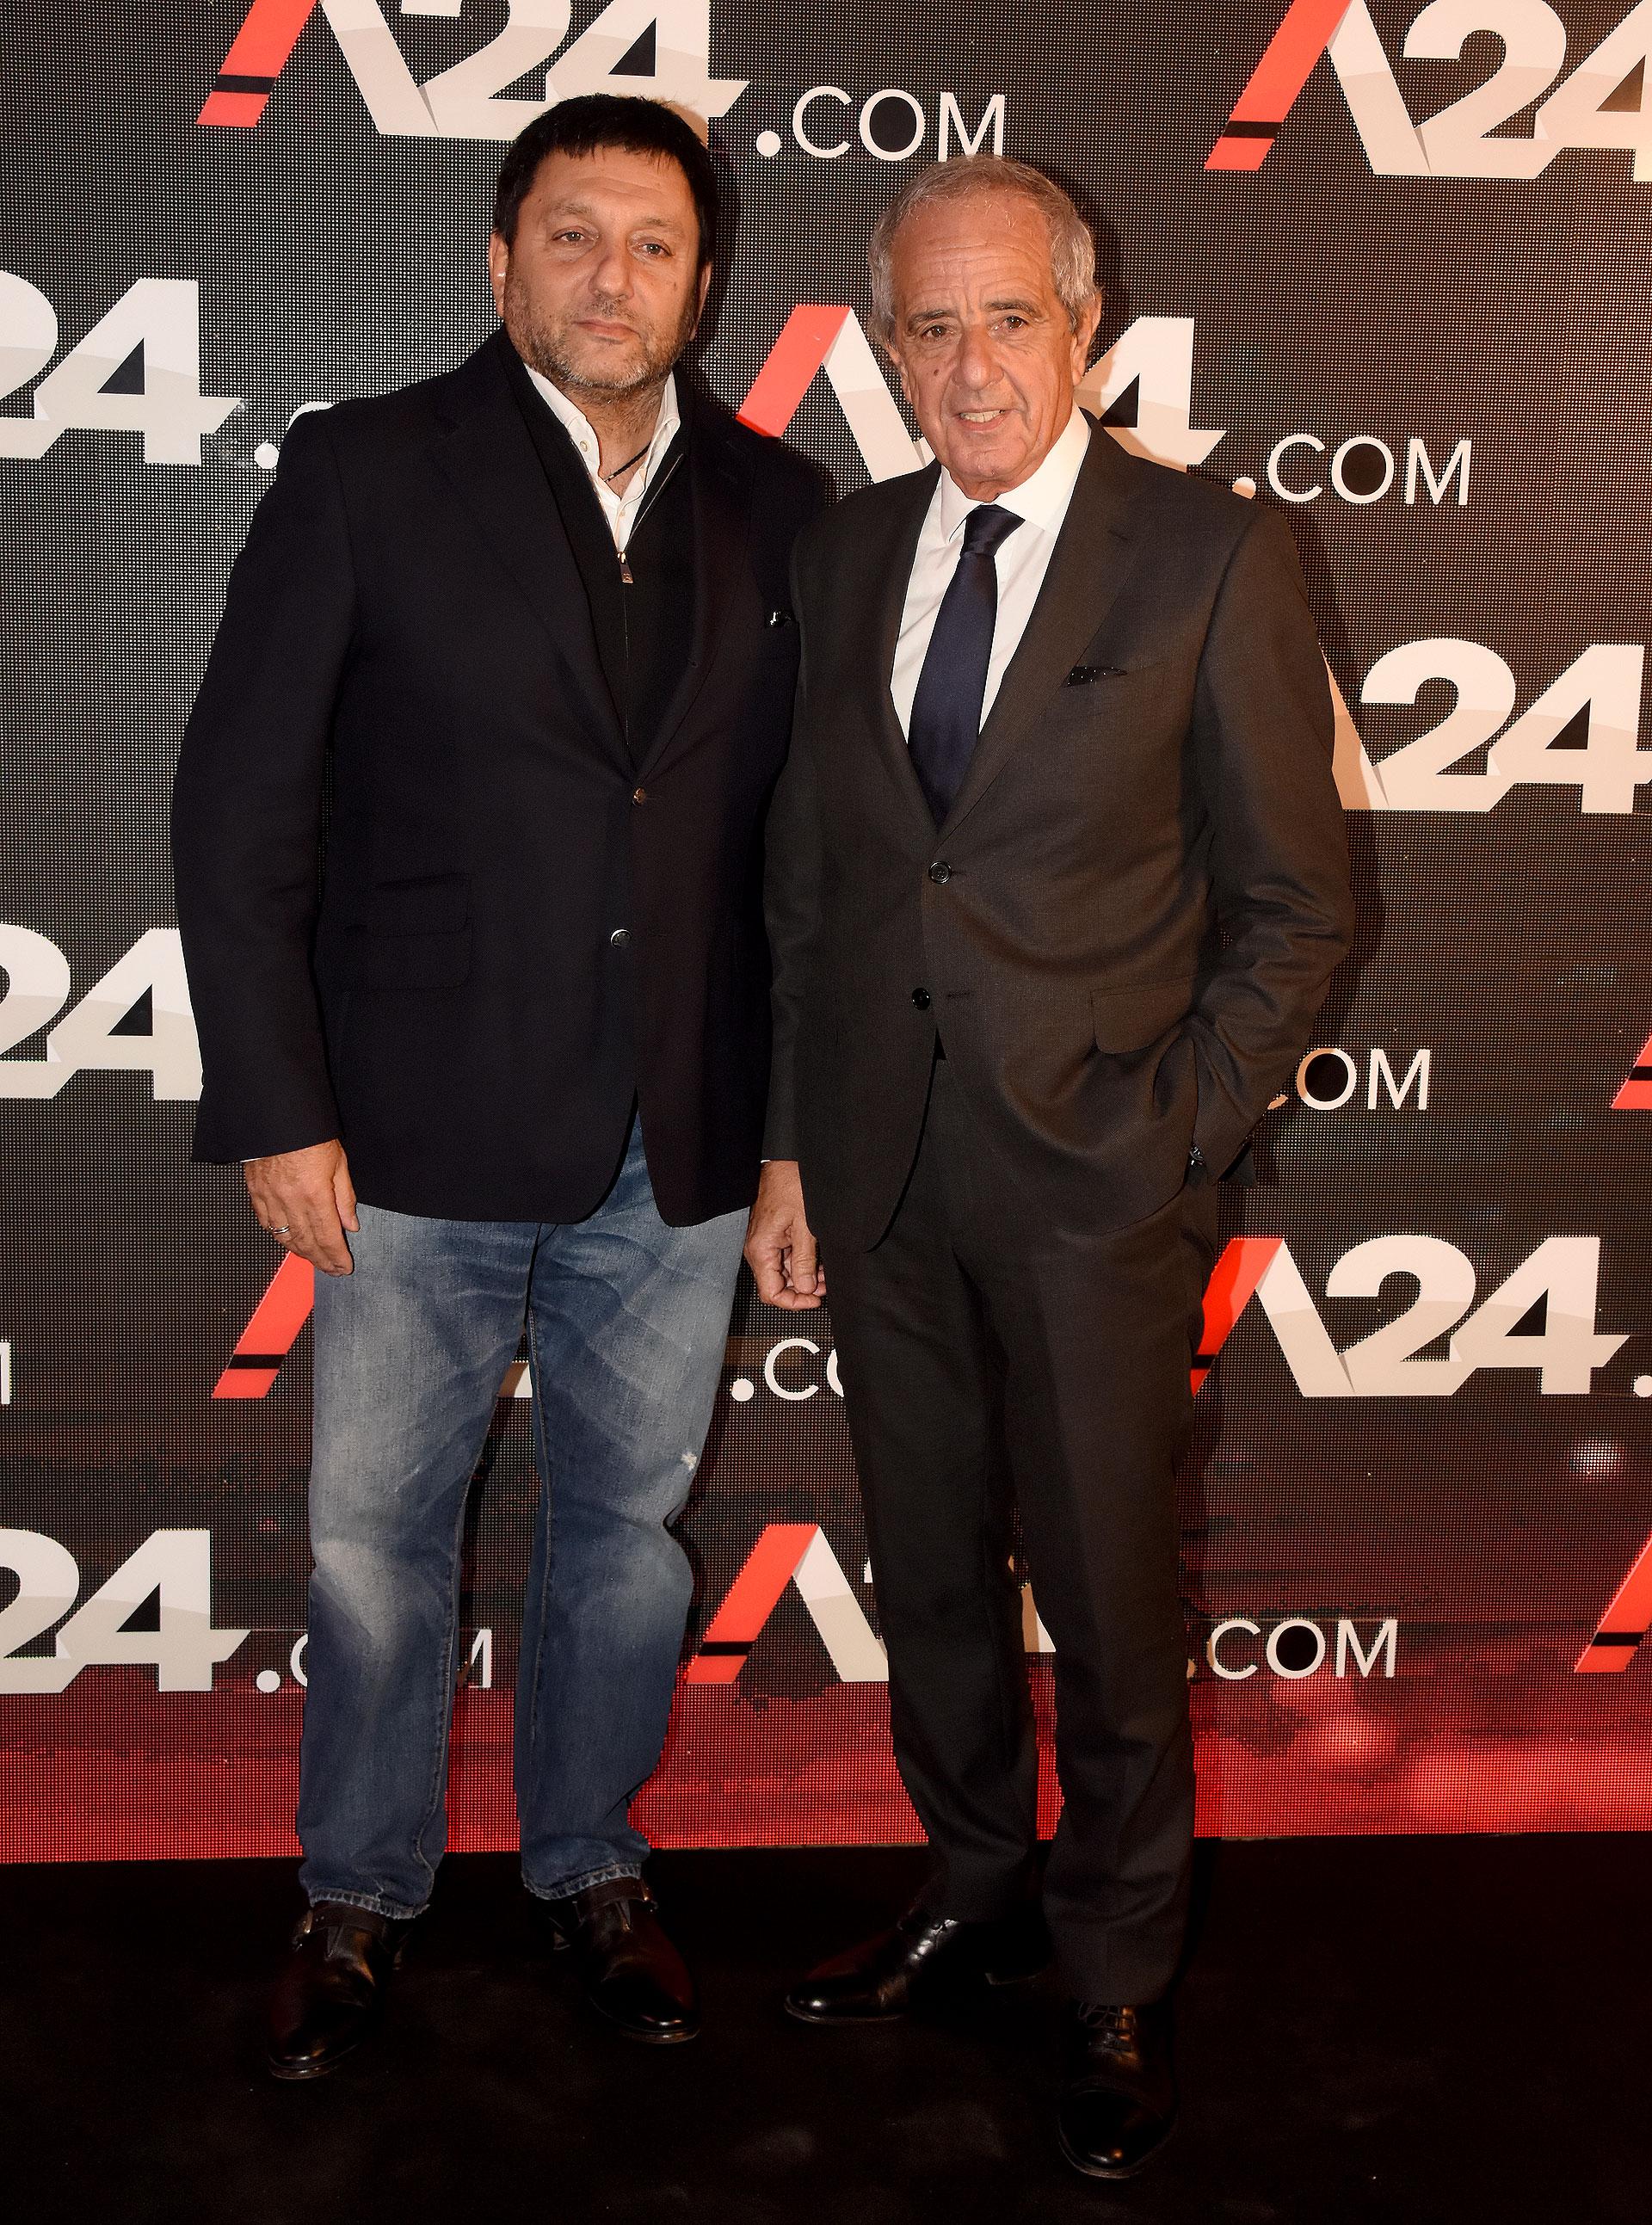 Gabriel Hochbaum y Rodolfo D'Onofrio, presidente de River Plate